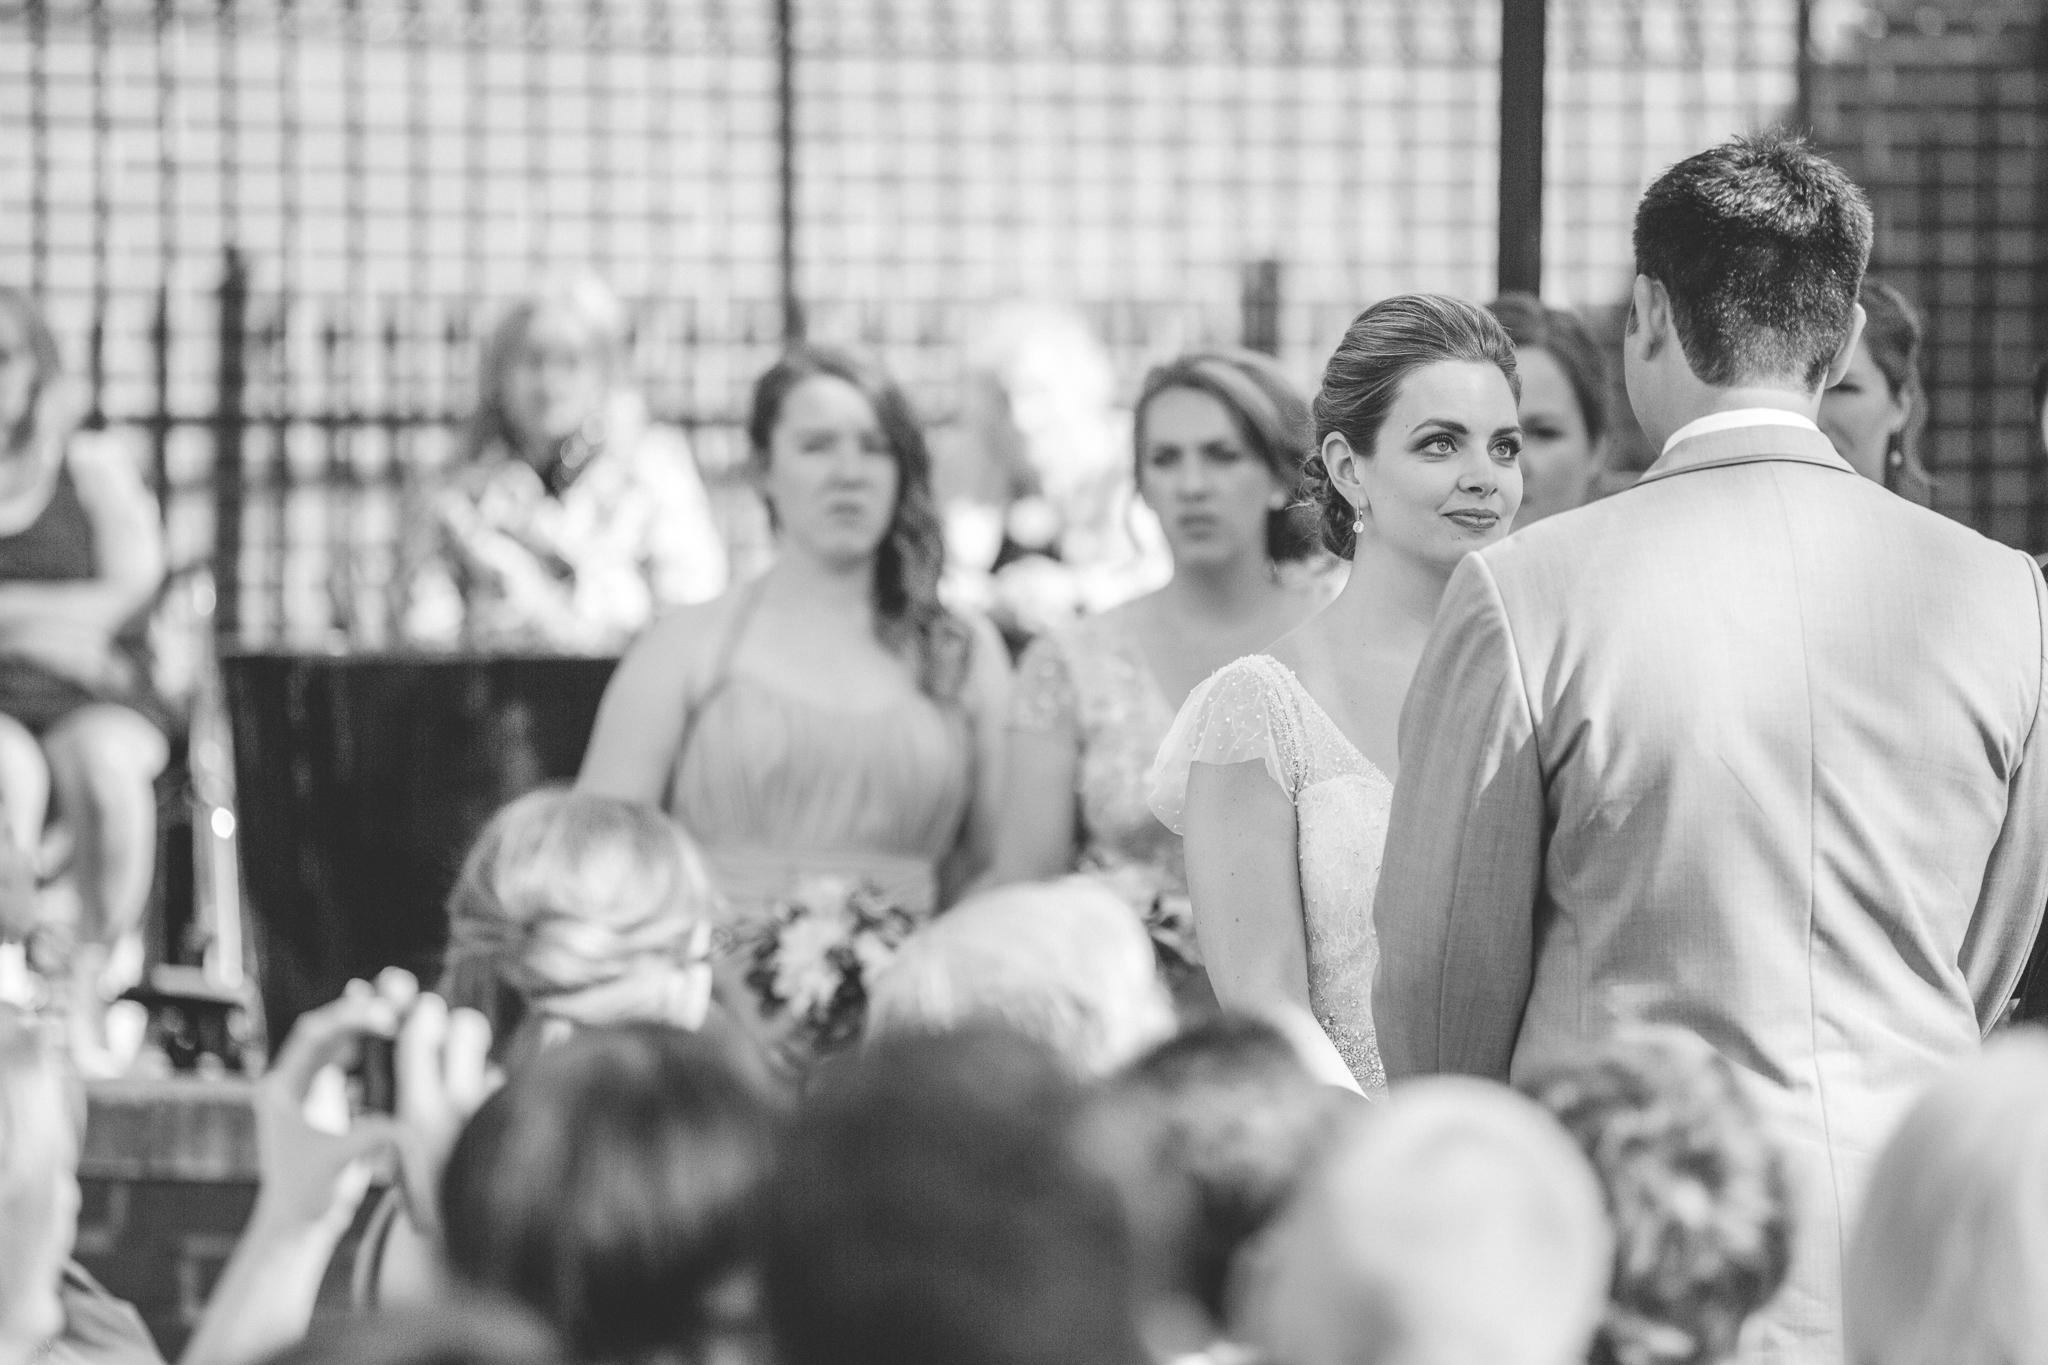 minneapolis event center wedding photographer-16.jpg